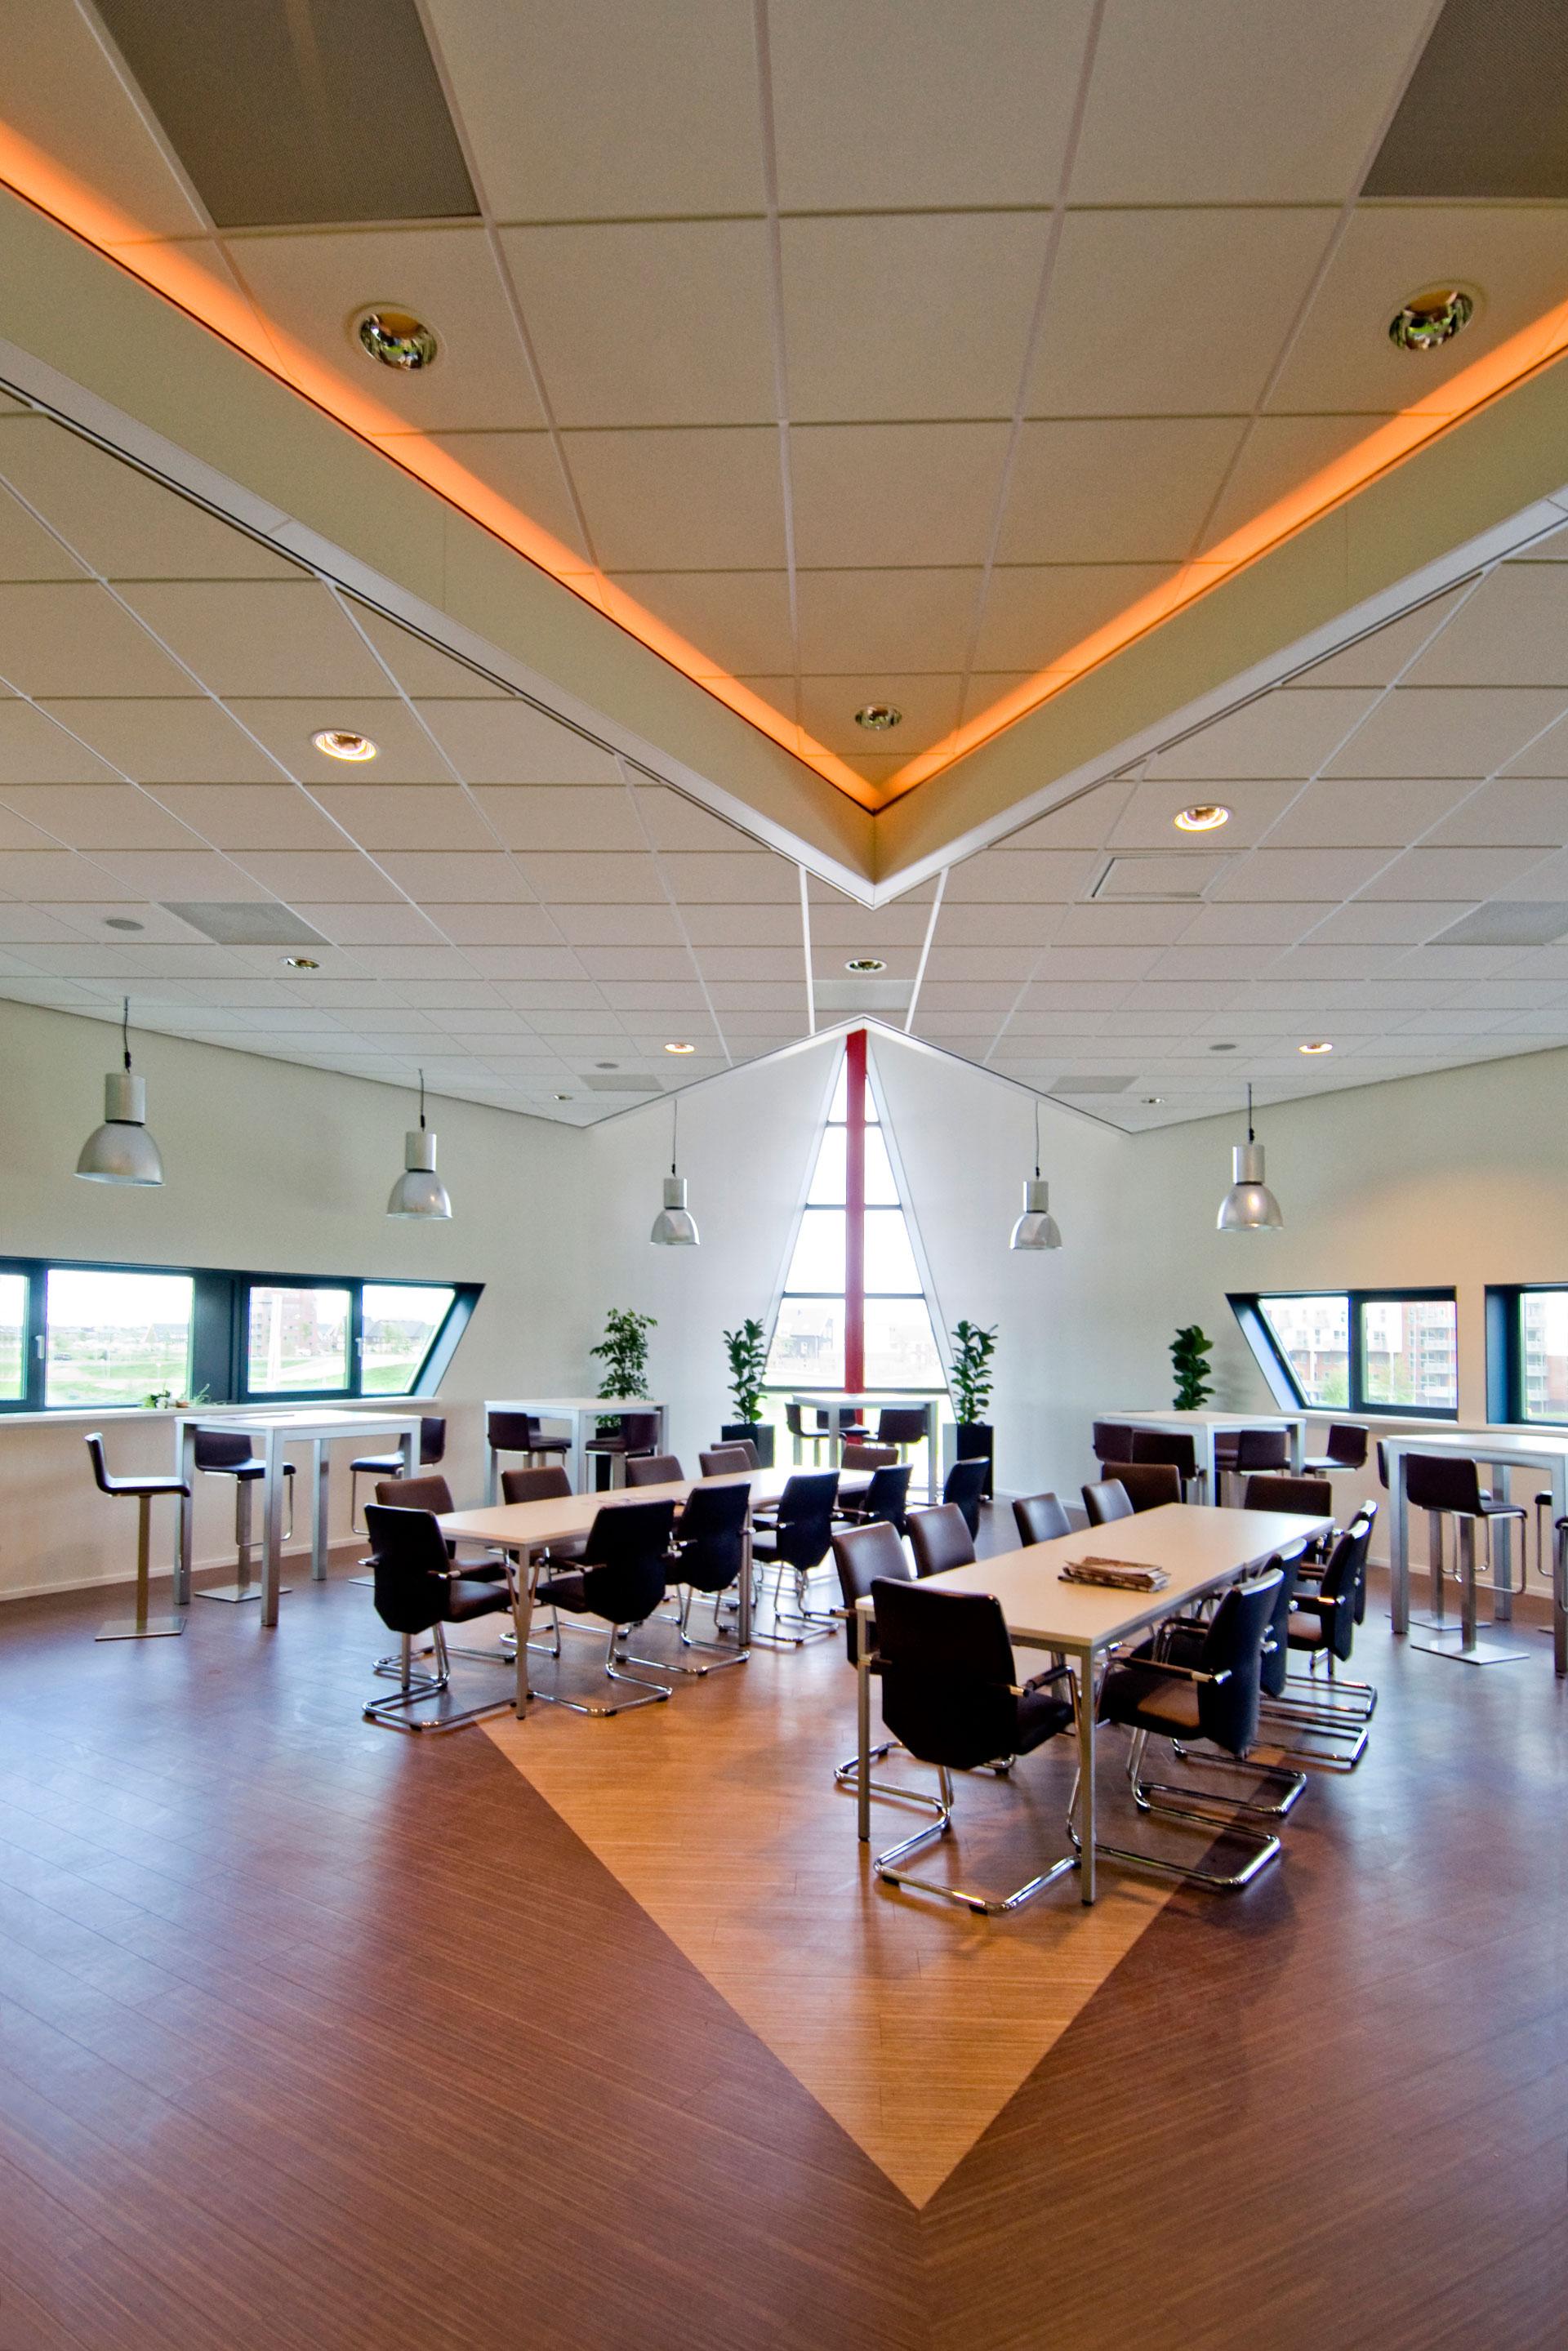 4397-Nijkerk-De-Flier-interieur-kantine-029-web - Bureau Bos